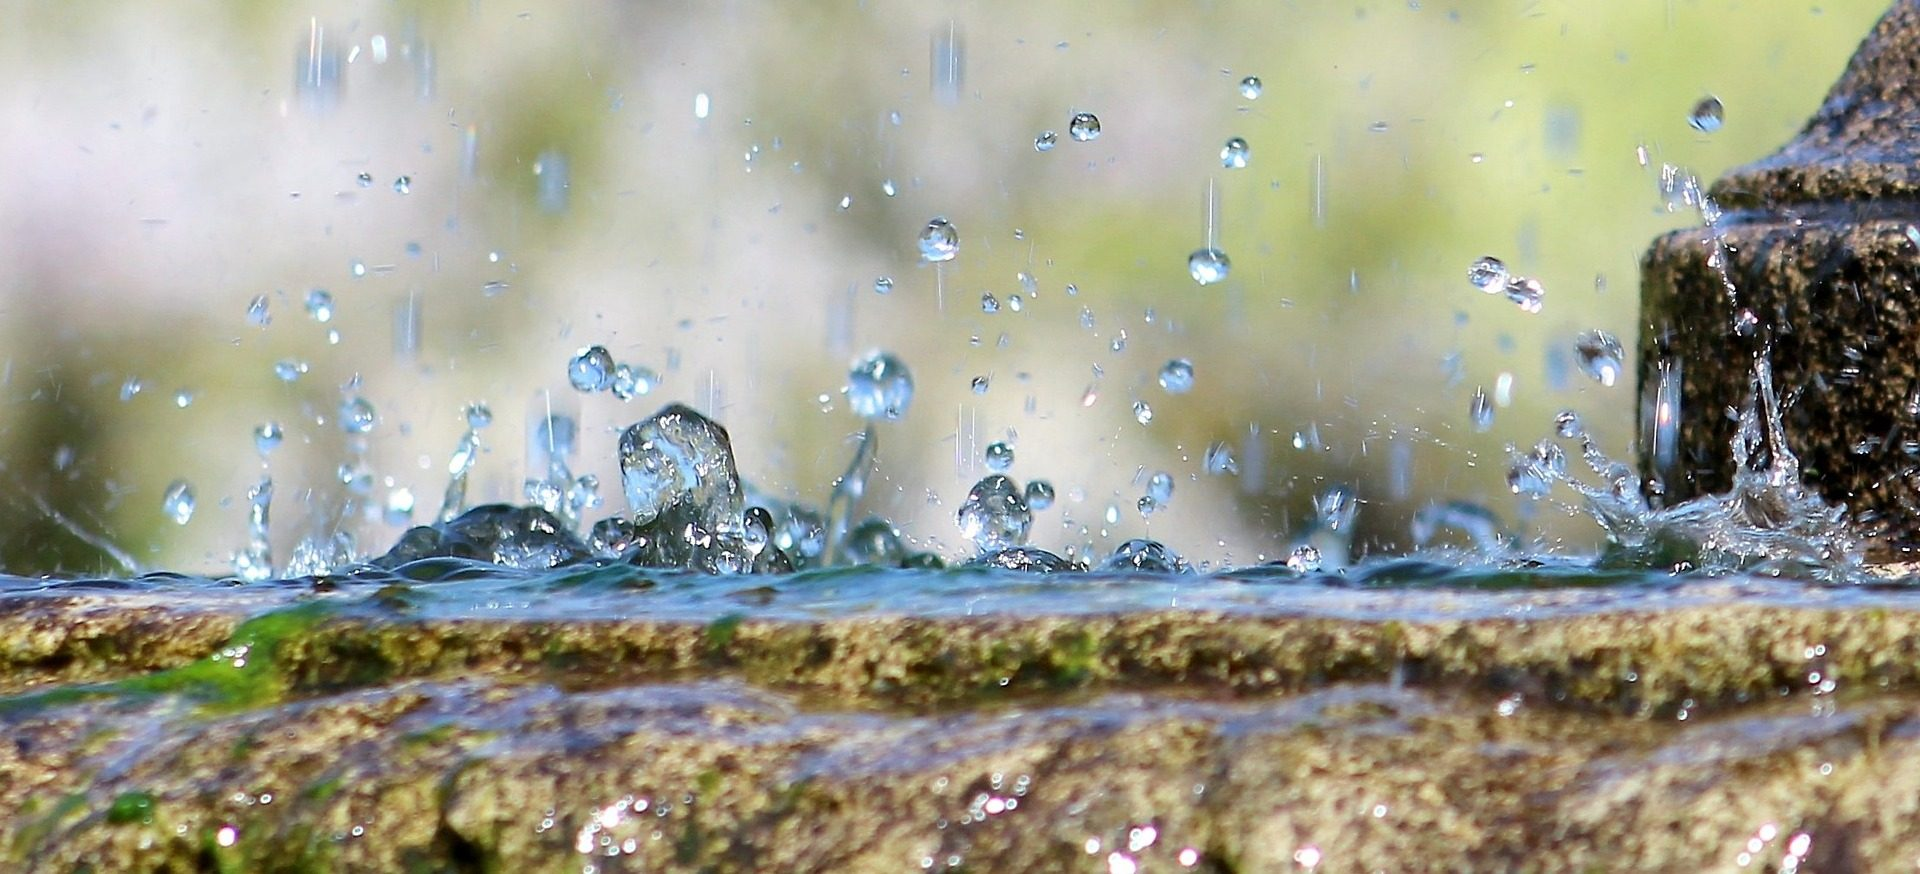 gotas, agua, fuente, manantial, sed - Fondos de Pantalla HD - professor-falken.com